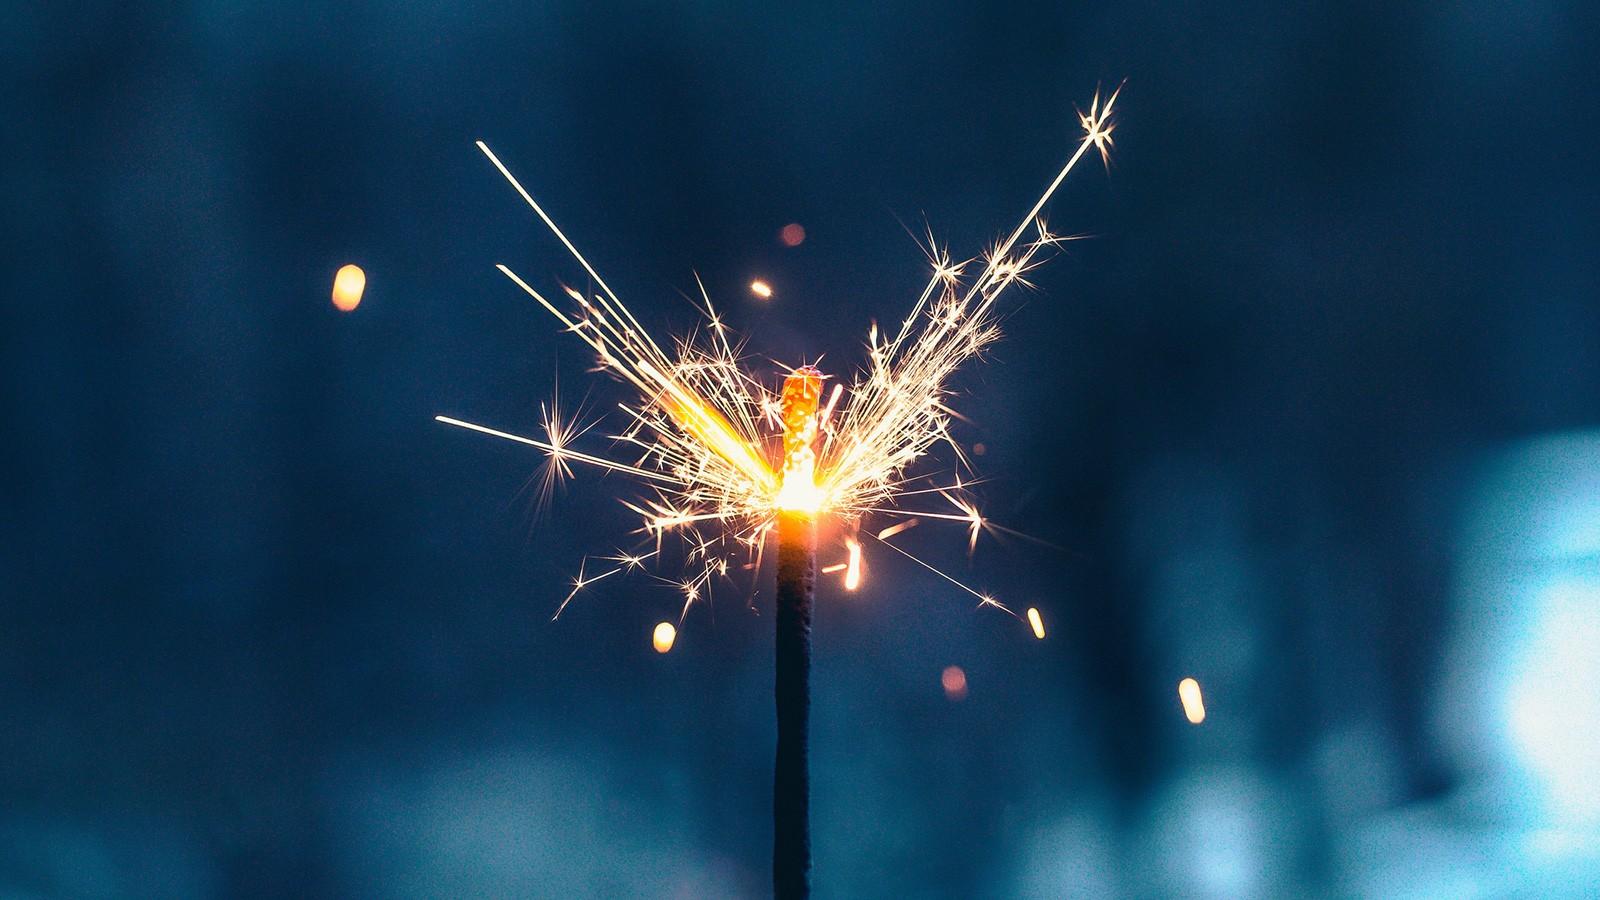 Bright fireworks sparkler at night